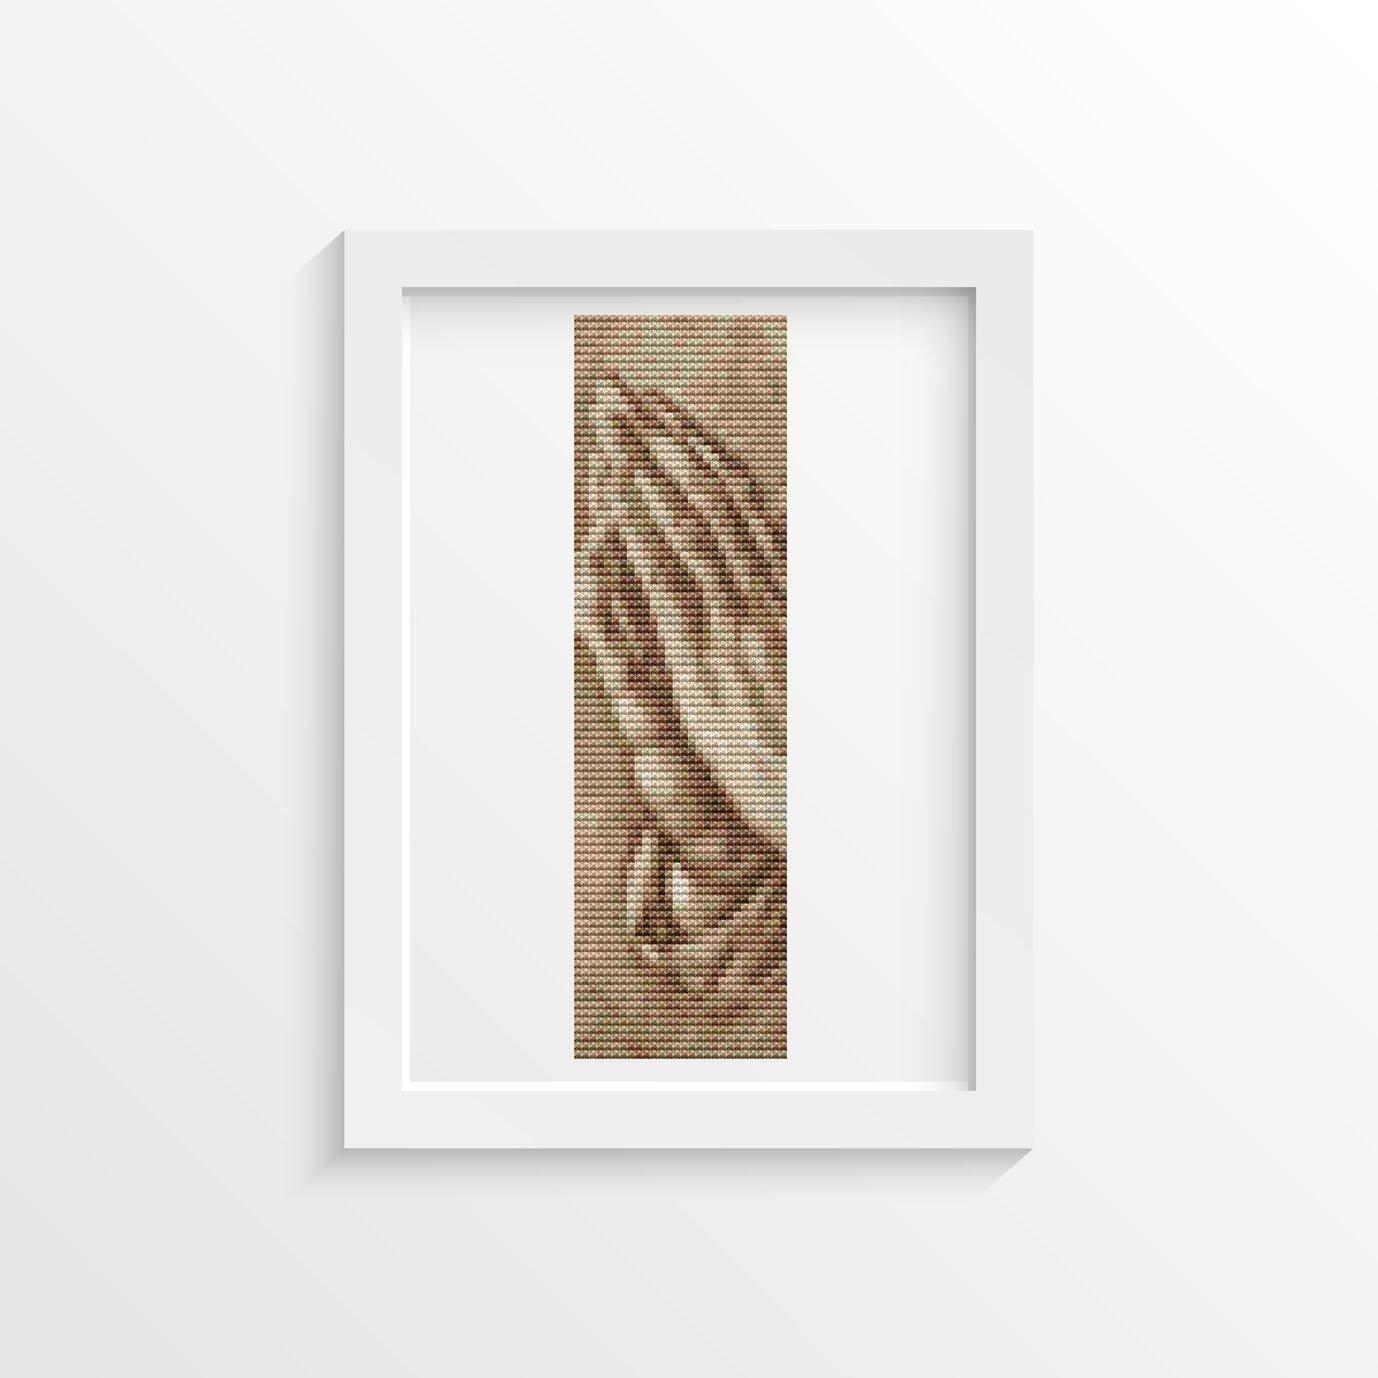 Praying Hands In Sepia Cross Stitch Kit by Albrecht Dürer (BOOKMARK)